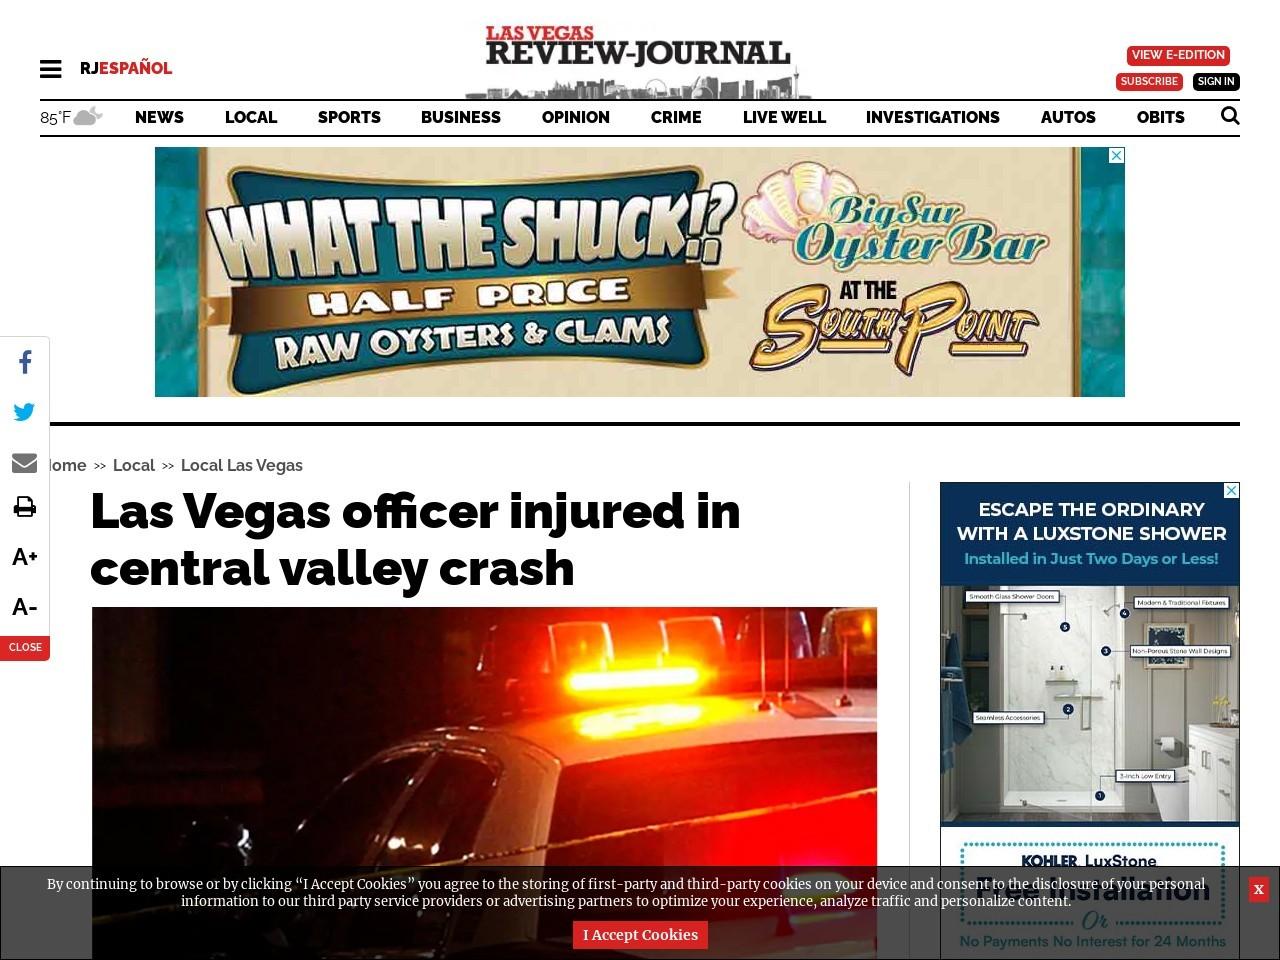 Las Vegas police officer injured in central valley crash